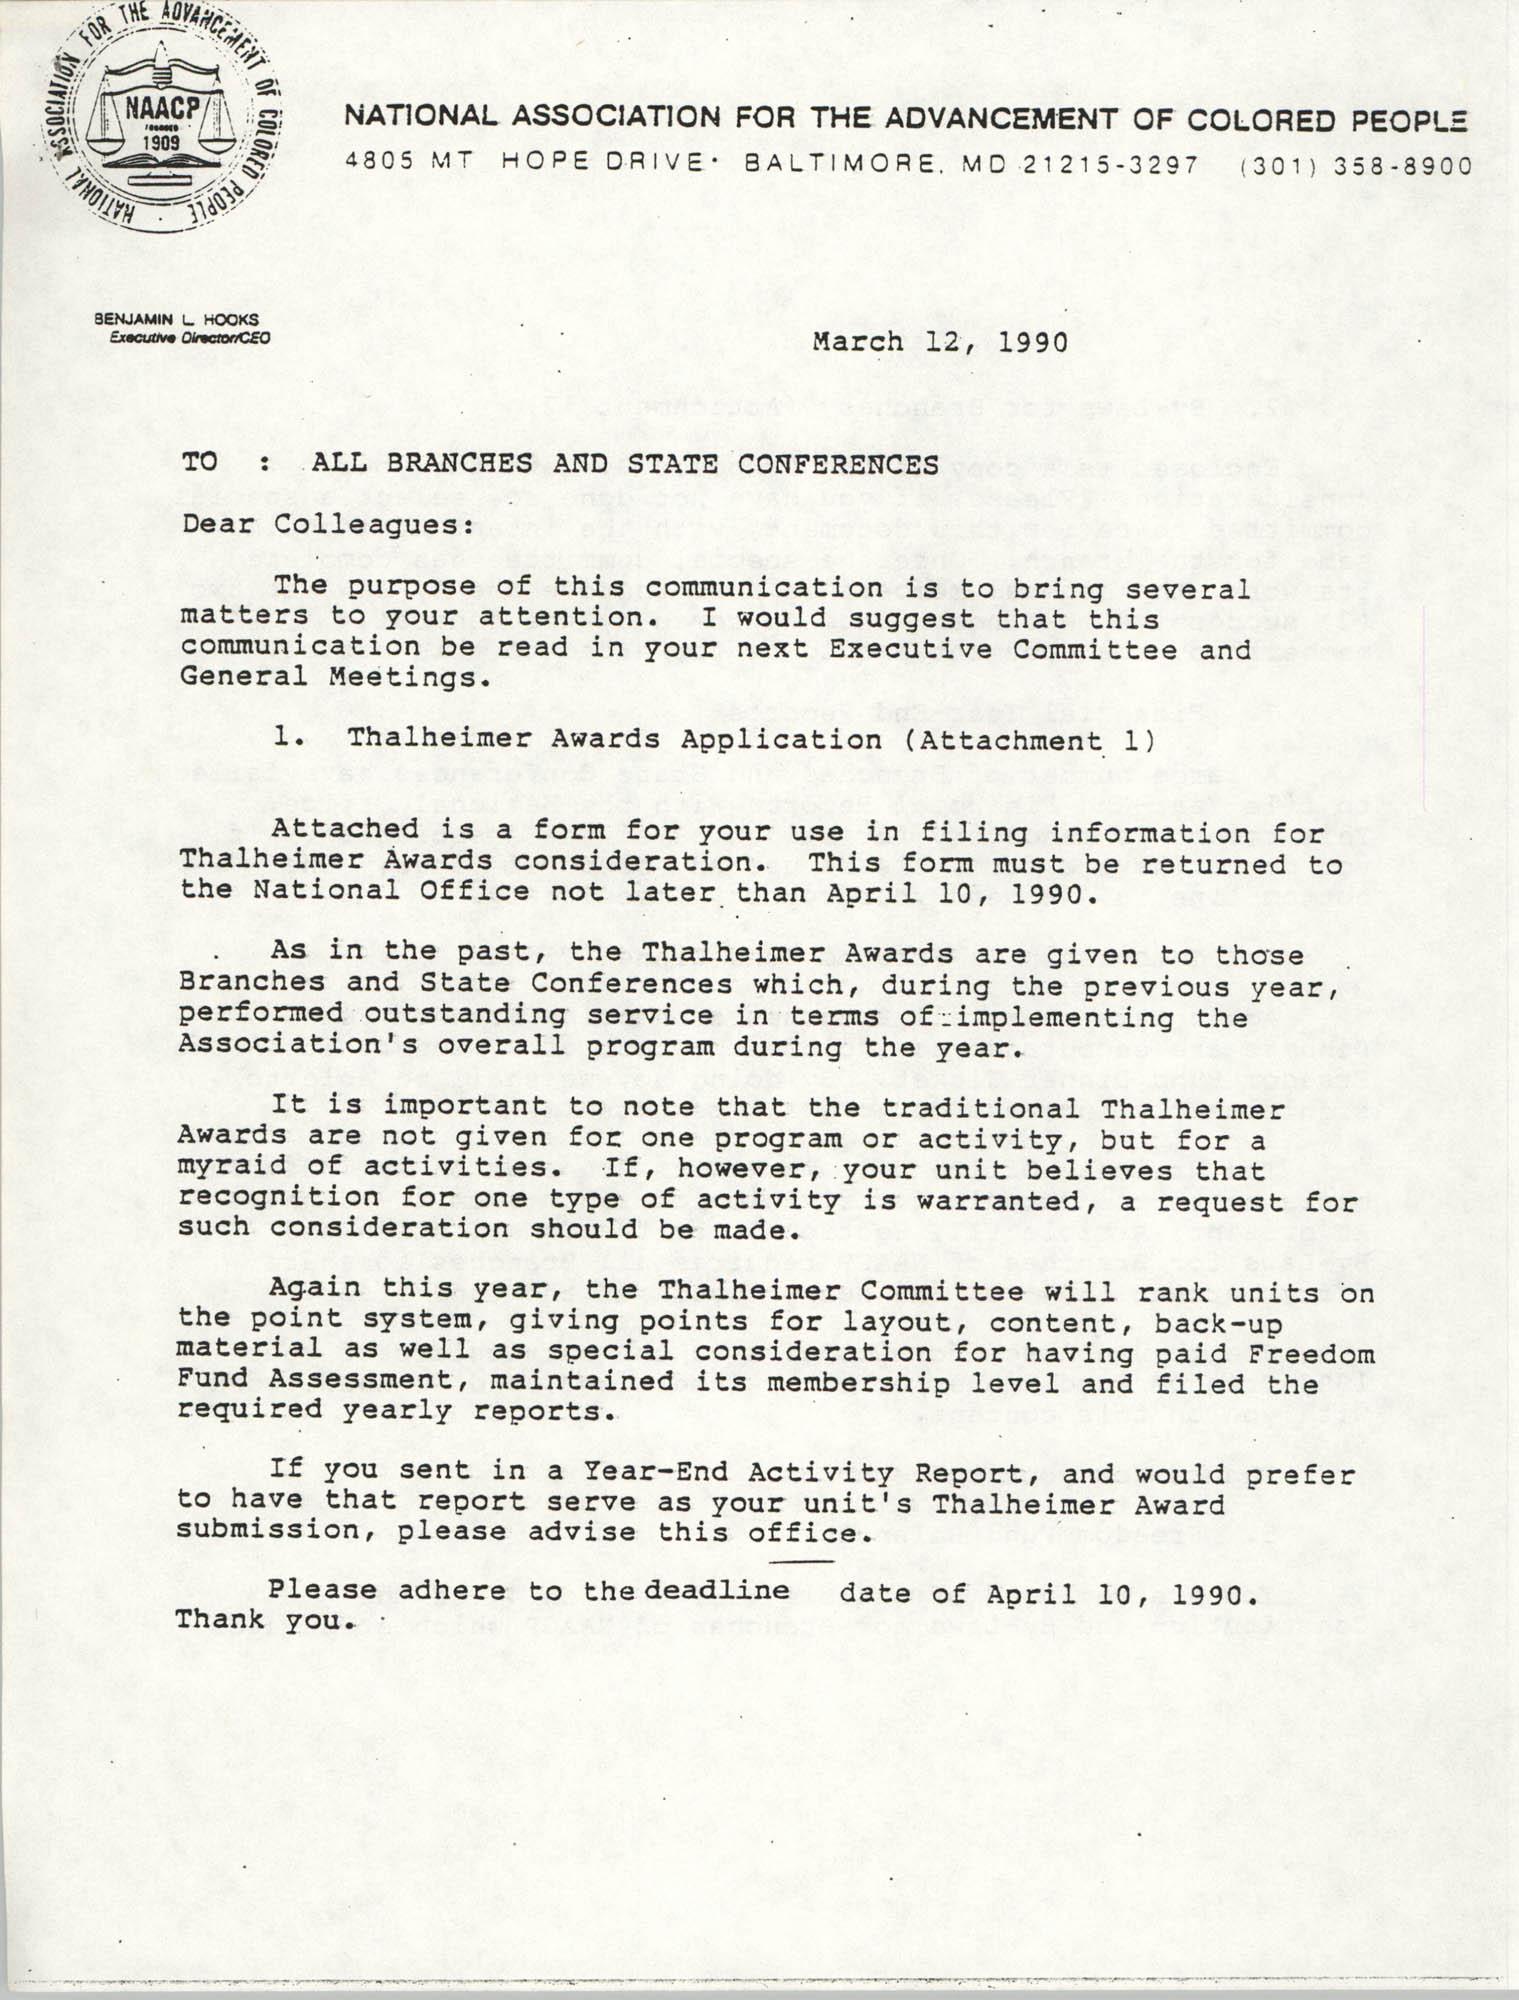 NAACP Memorandum, March 12, 1990